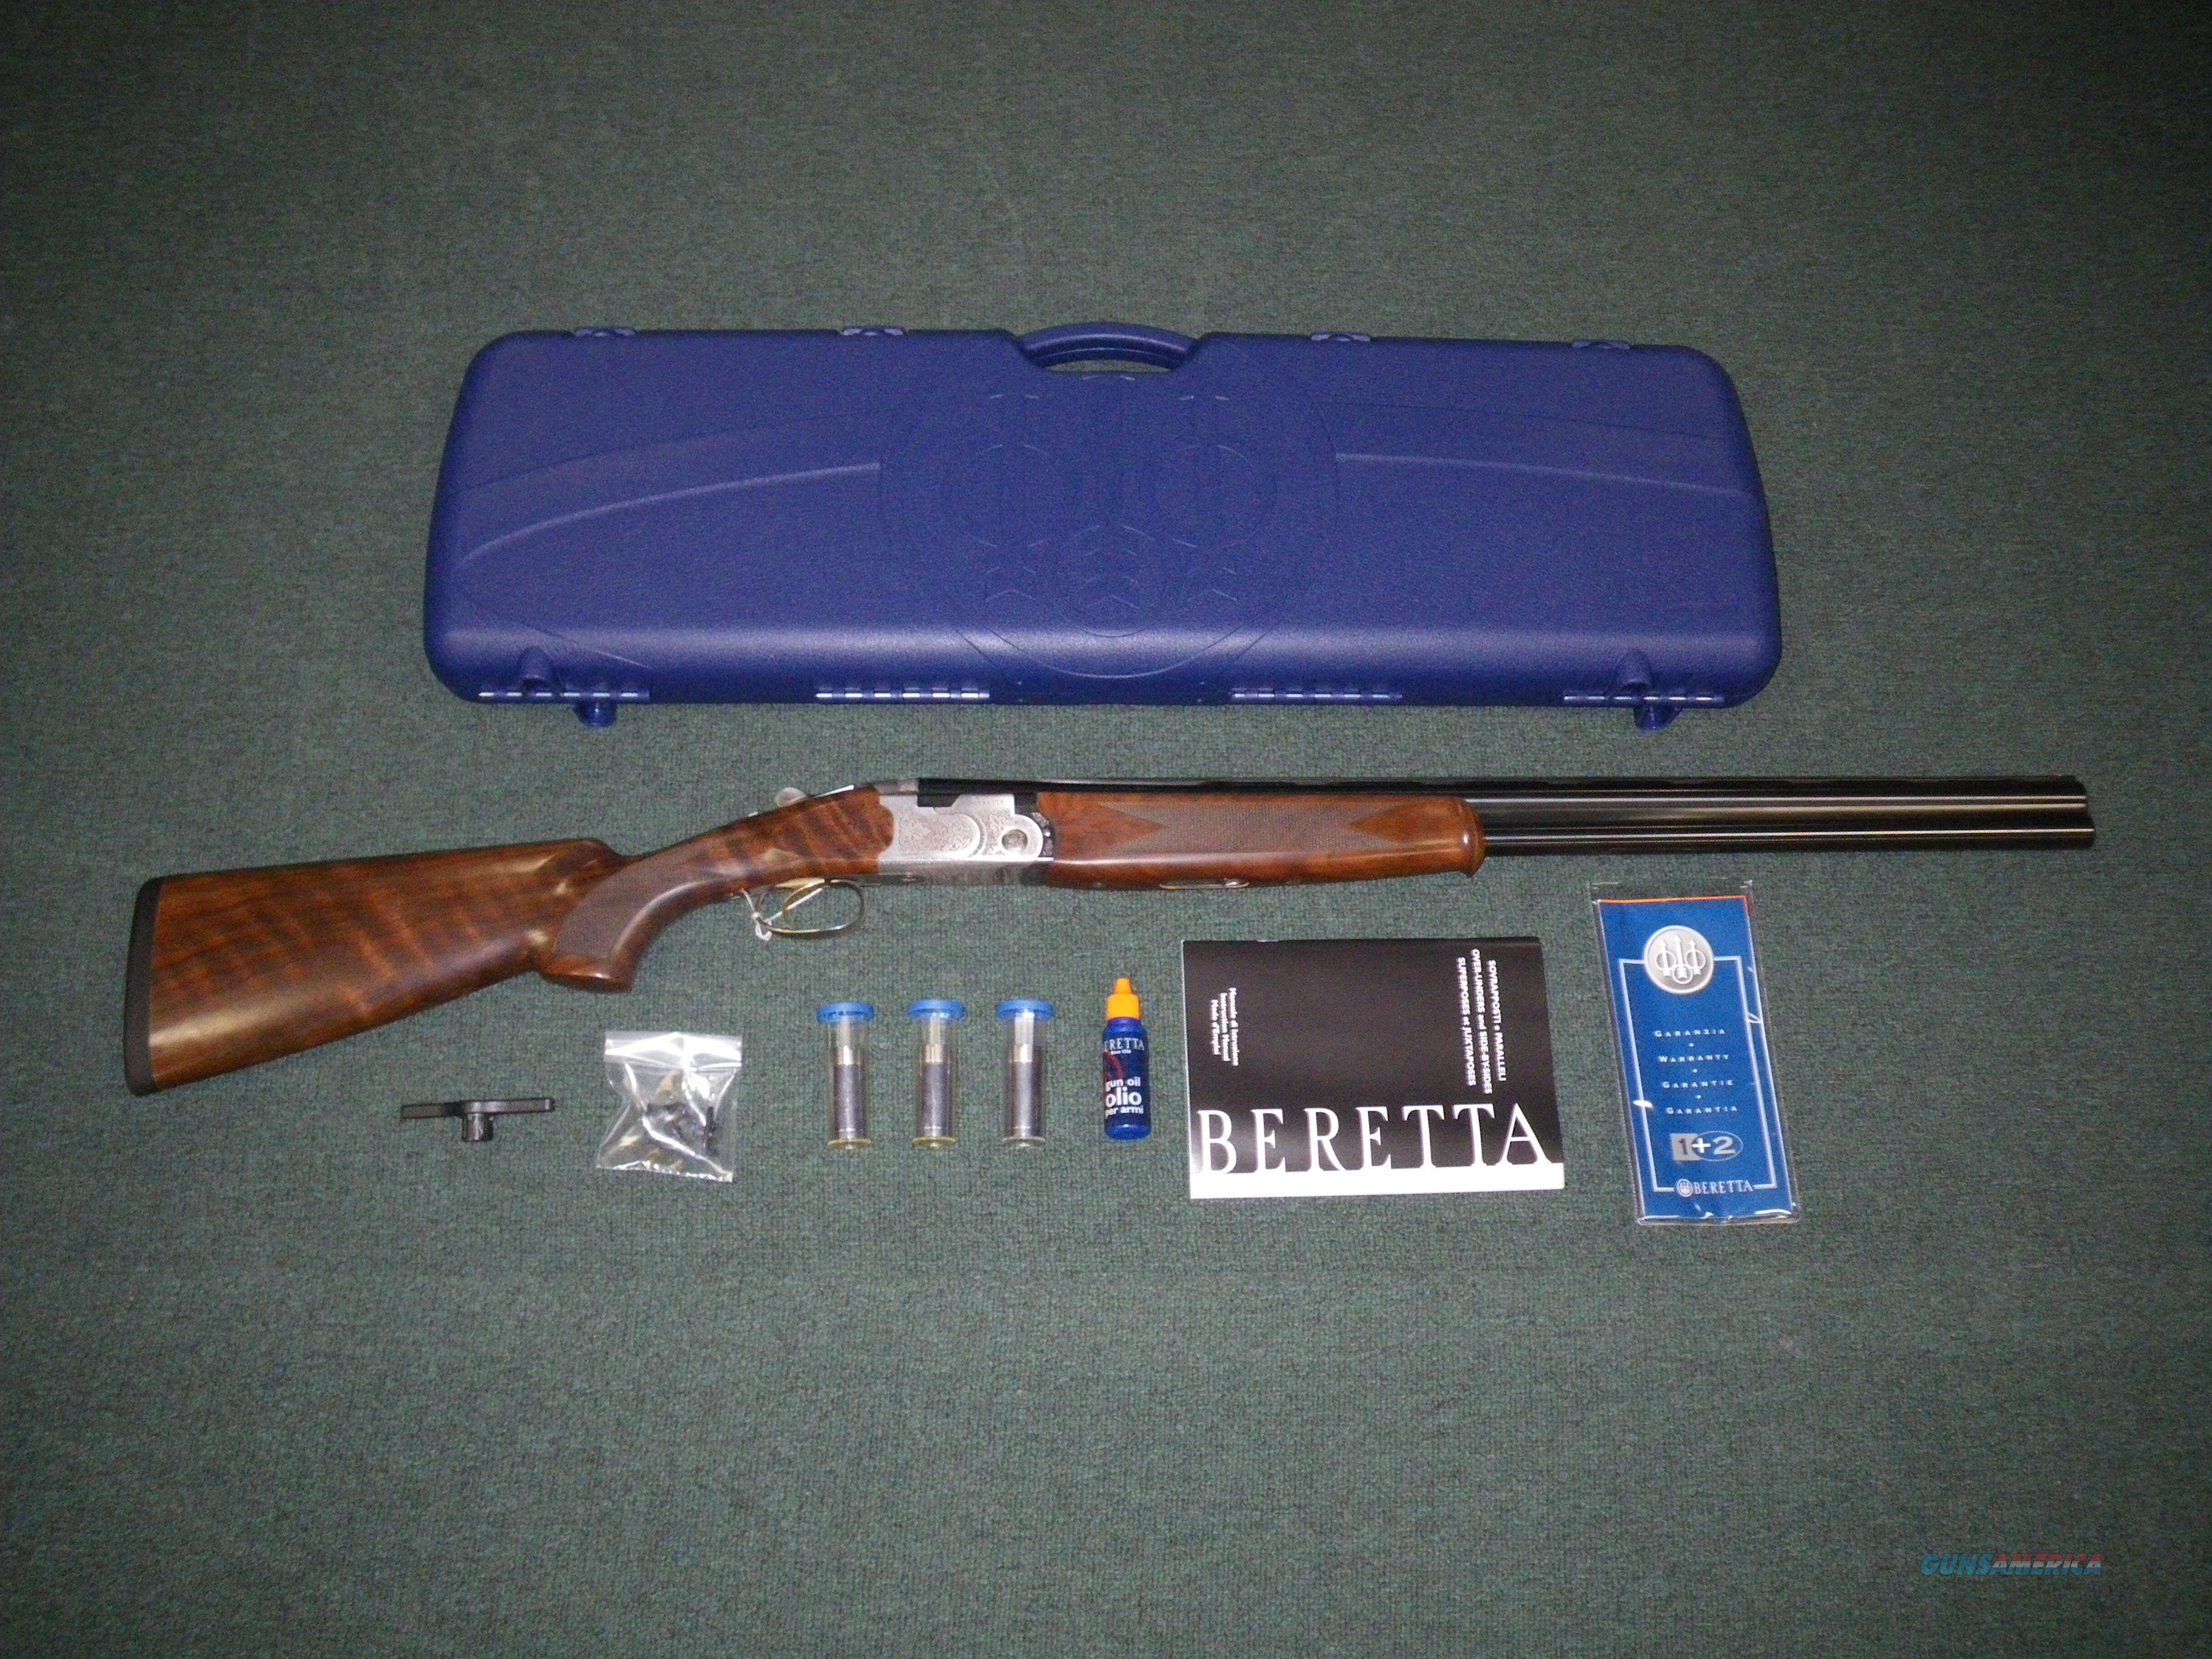 "Beretta 686 Silver Pigeon I 28ga 28"" Over Under J6863M8  Guns > Shotguns > Beretta Shotguns > O/U > Hunting"